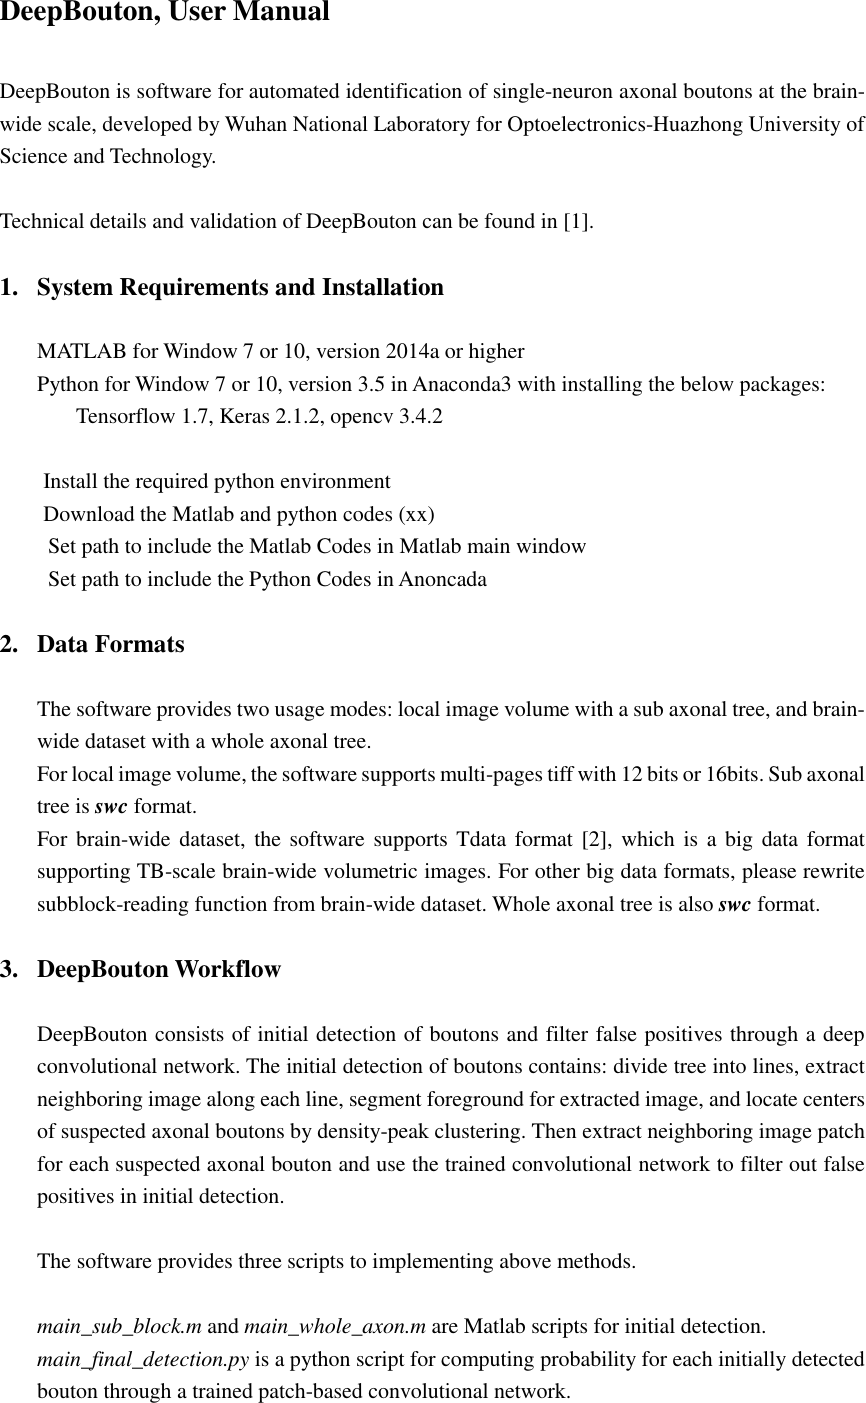 Deep Bouton User Manual